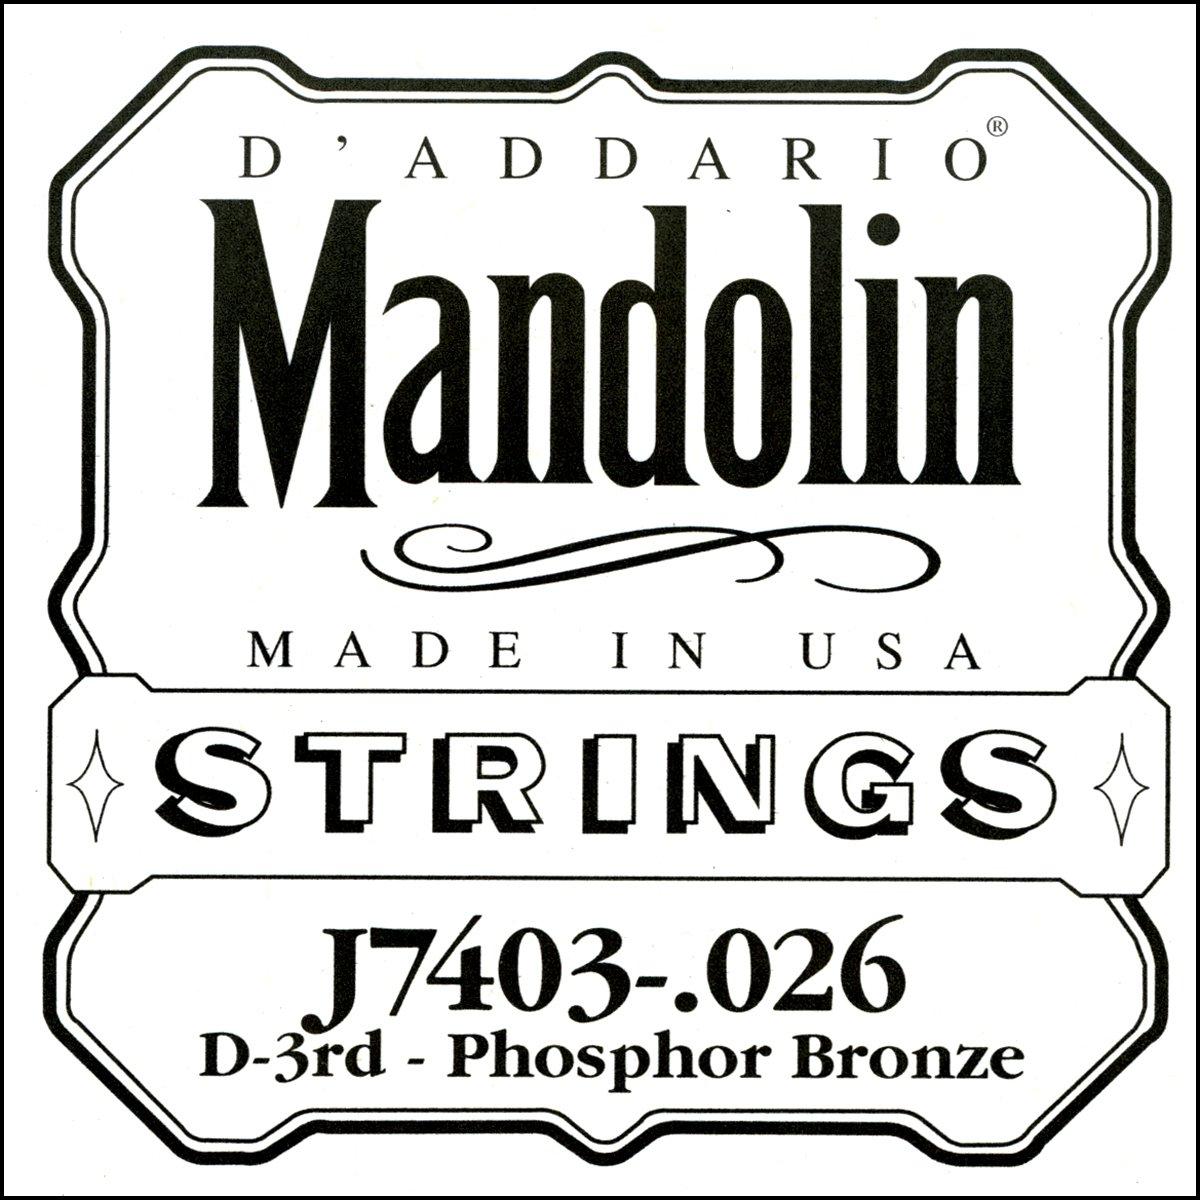 D'Addario J7403 Phosphor Bronze Mandolin Single String, Third String, .026 D' Addario